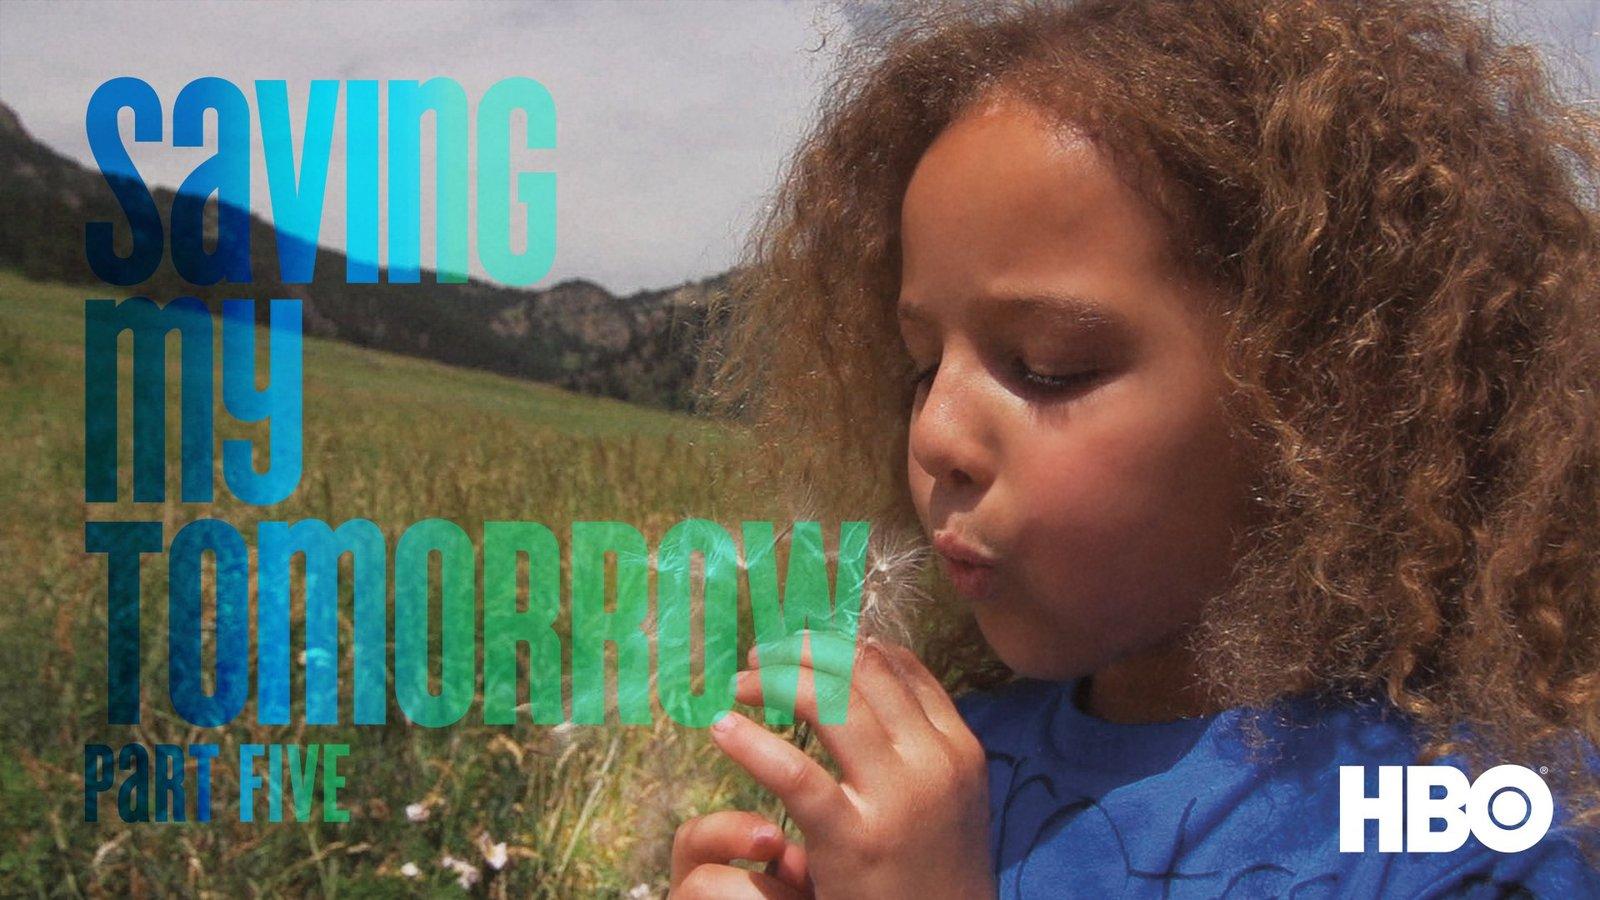 Saving My Tomorrow - Kids Who Love the Earth